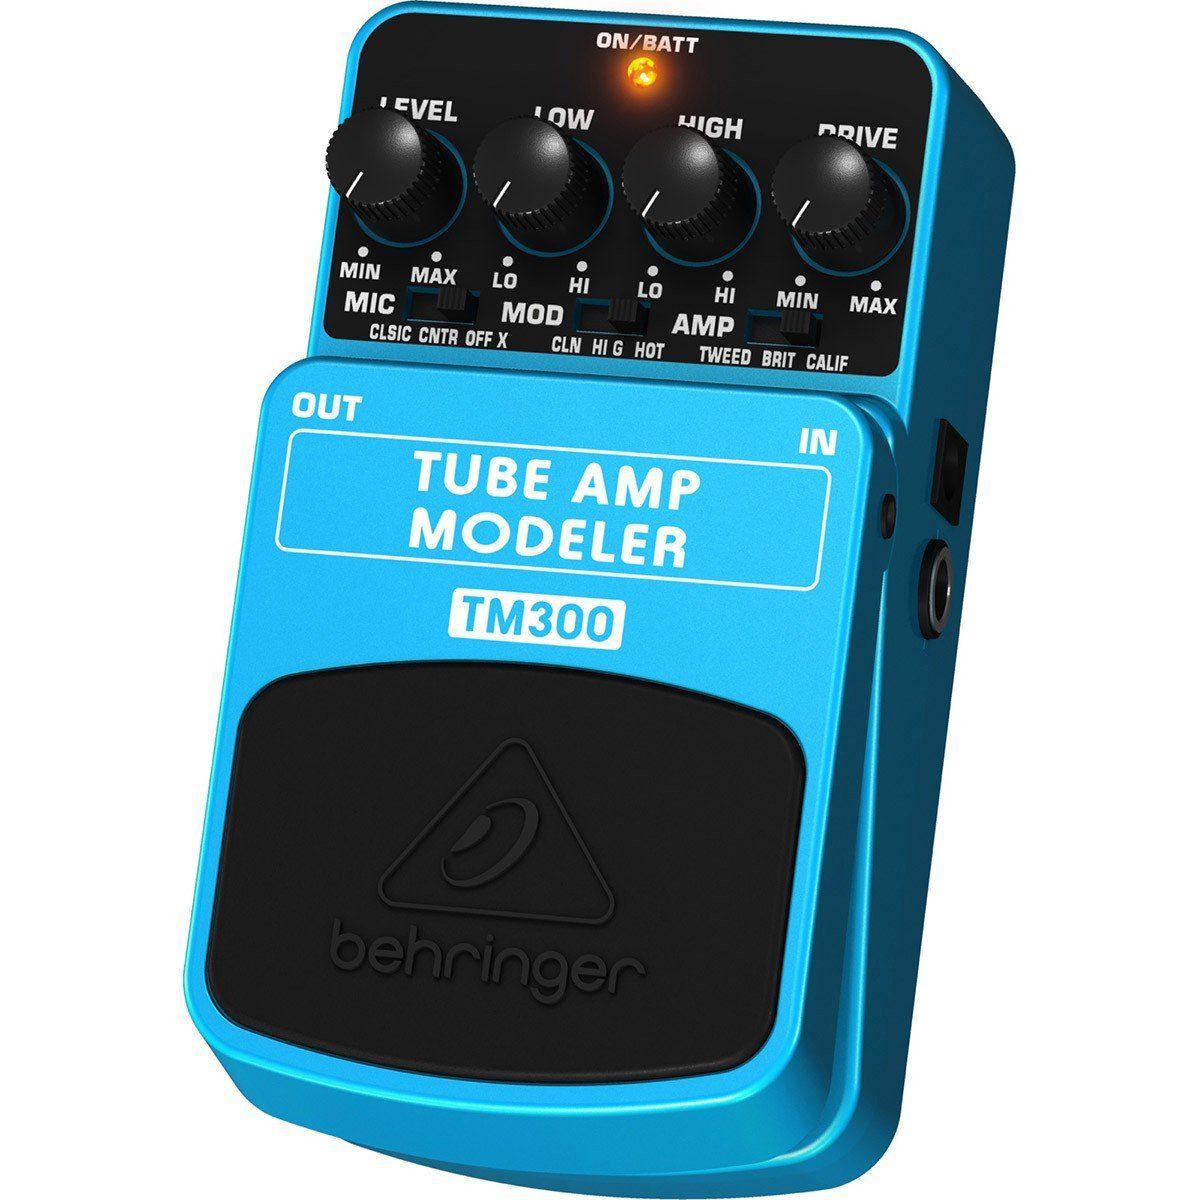 Behringer TM300 Tube Amp Modeler Pedal para Guitarras Elétricas Shows